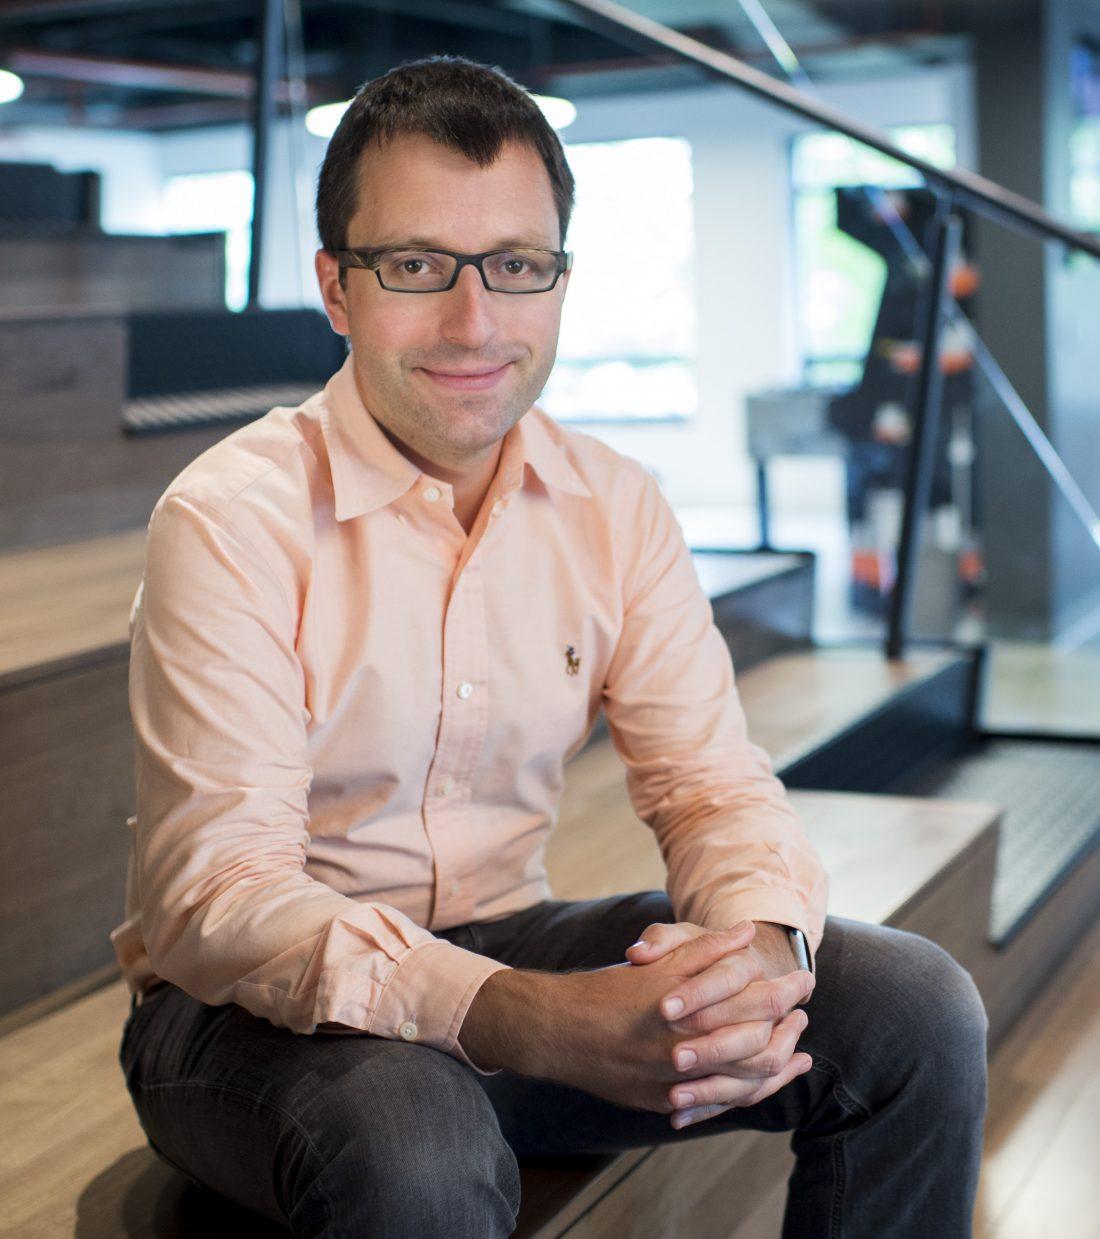 Matthias Keller, Chief Scientist - transforming travel planning at KAYAK